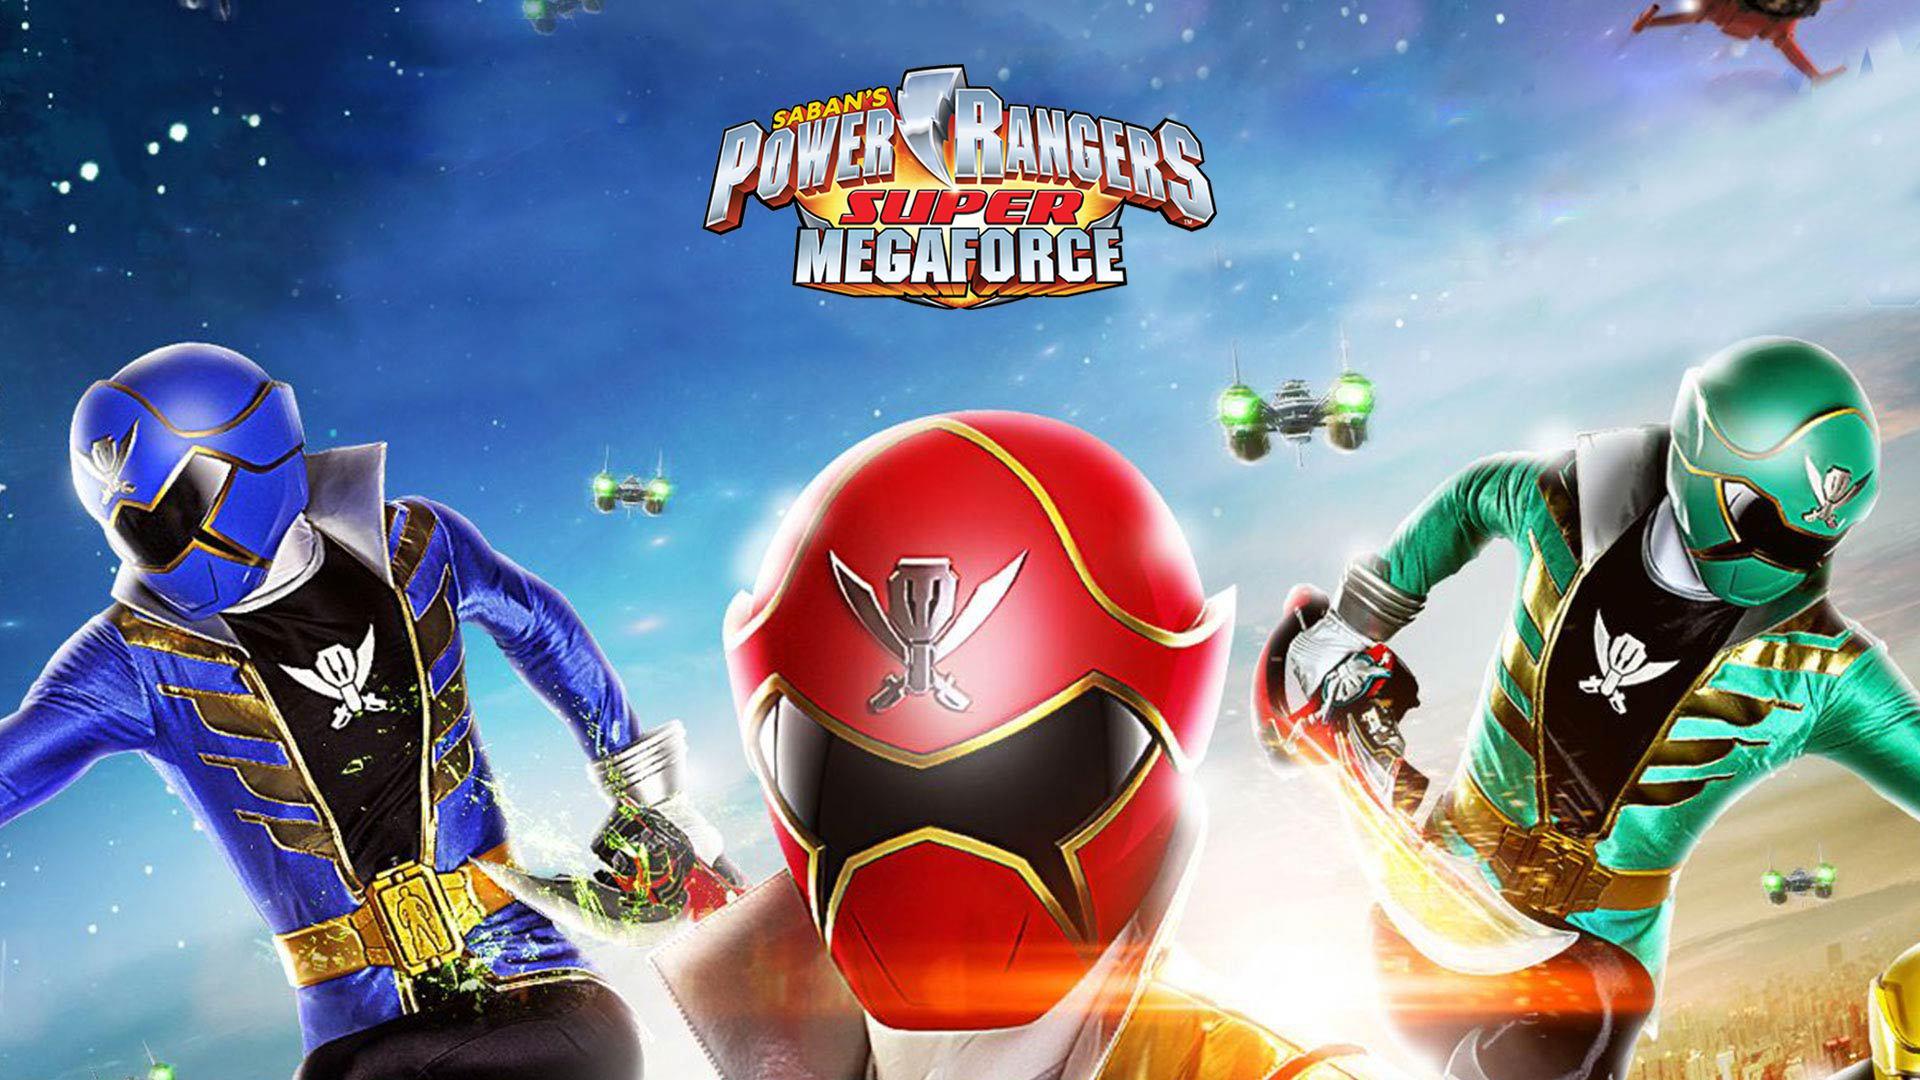 Power Rangers Super Megaforce Season 1